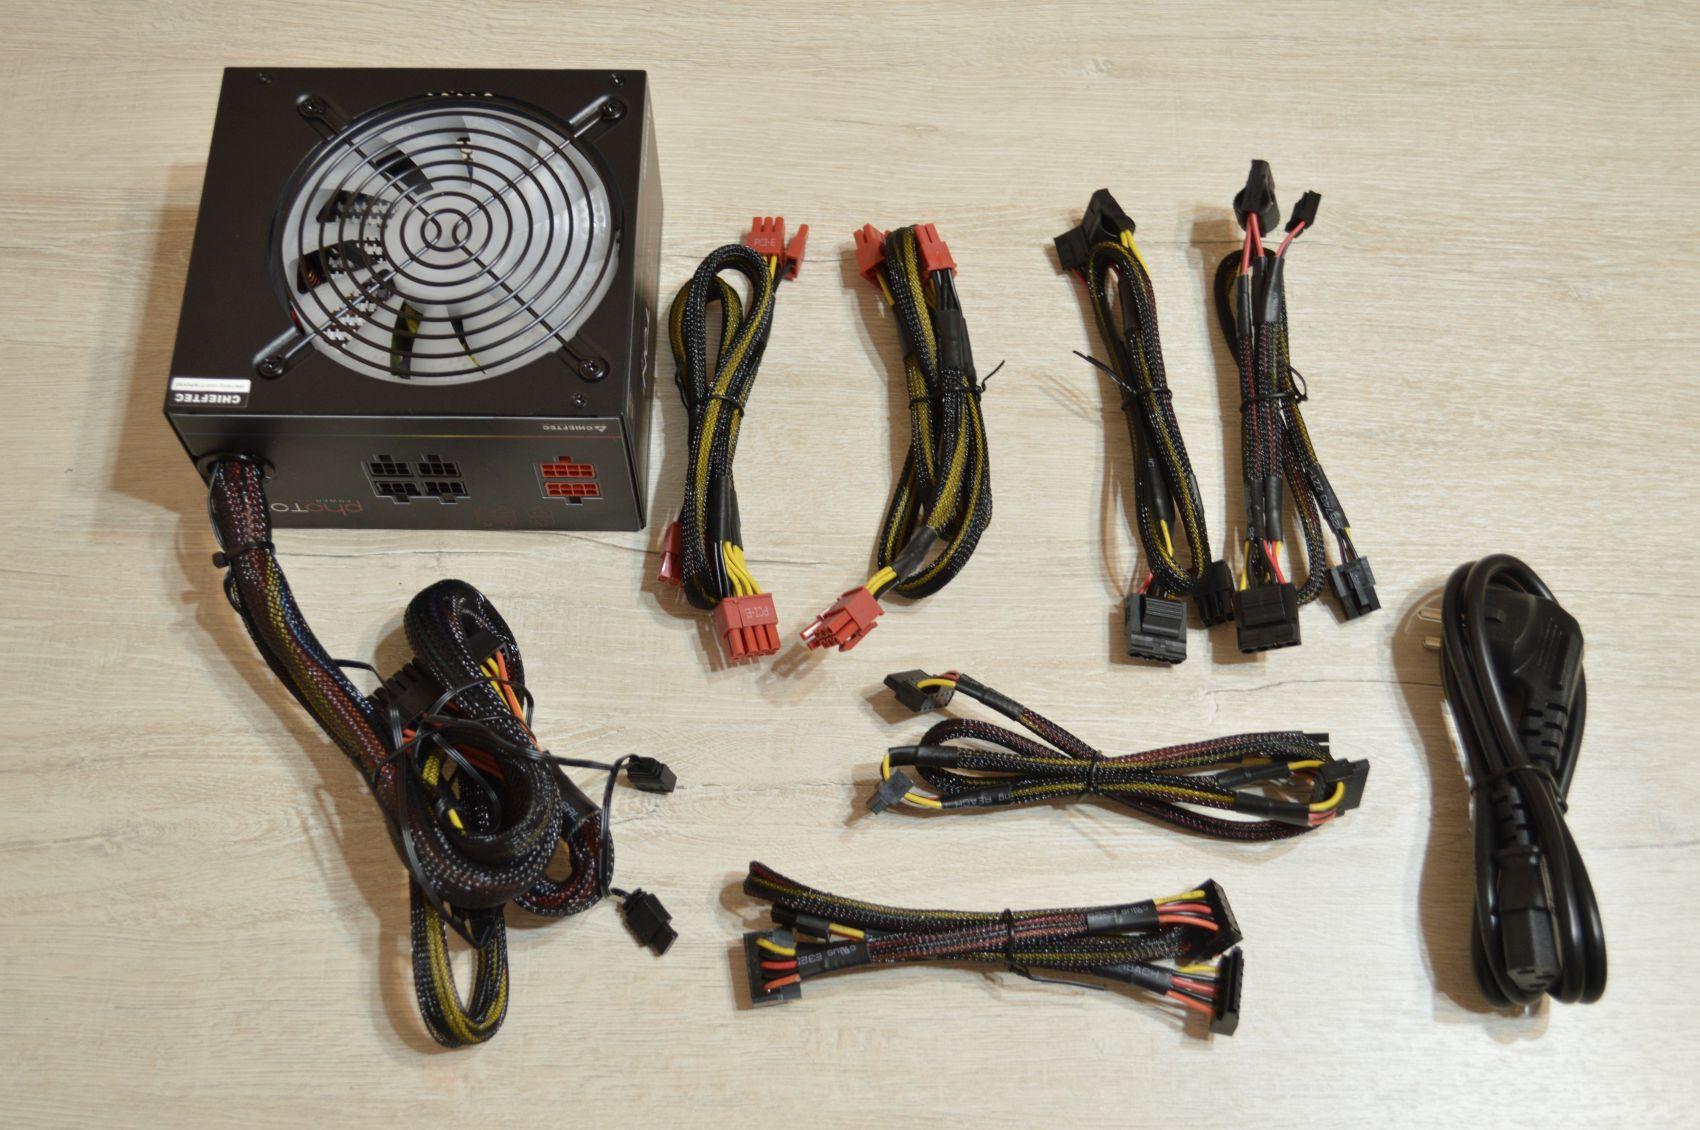 Chieftec Photon 750 Вт комплектация